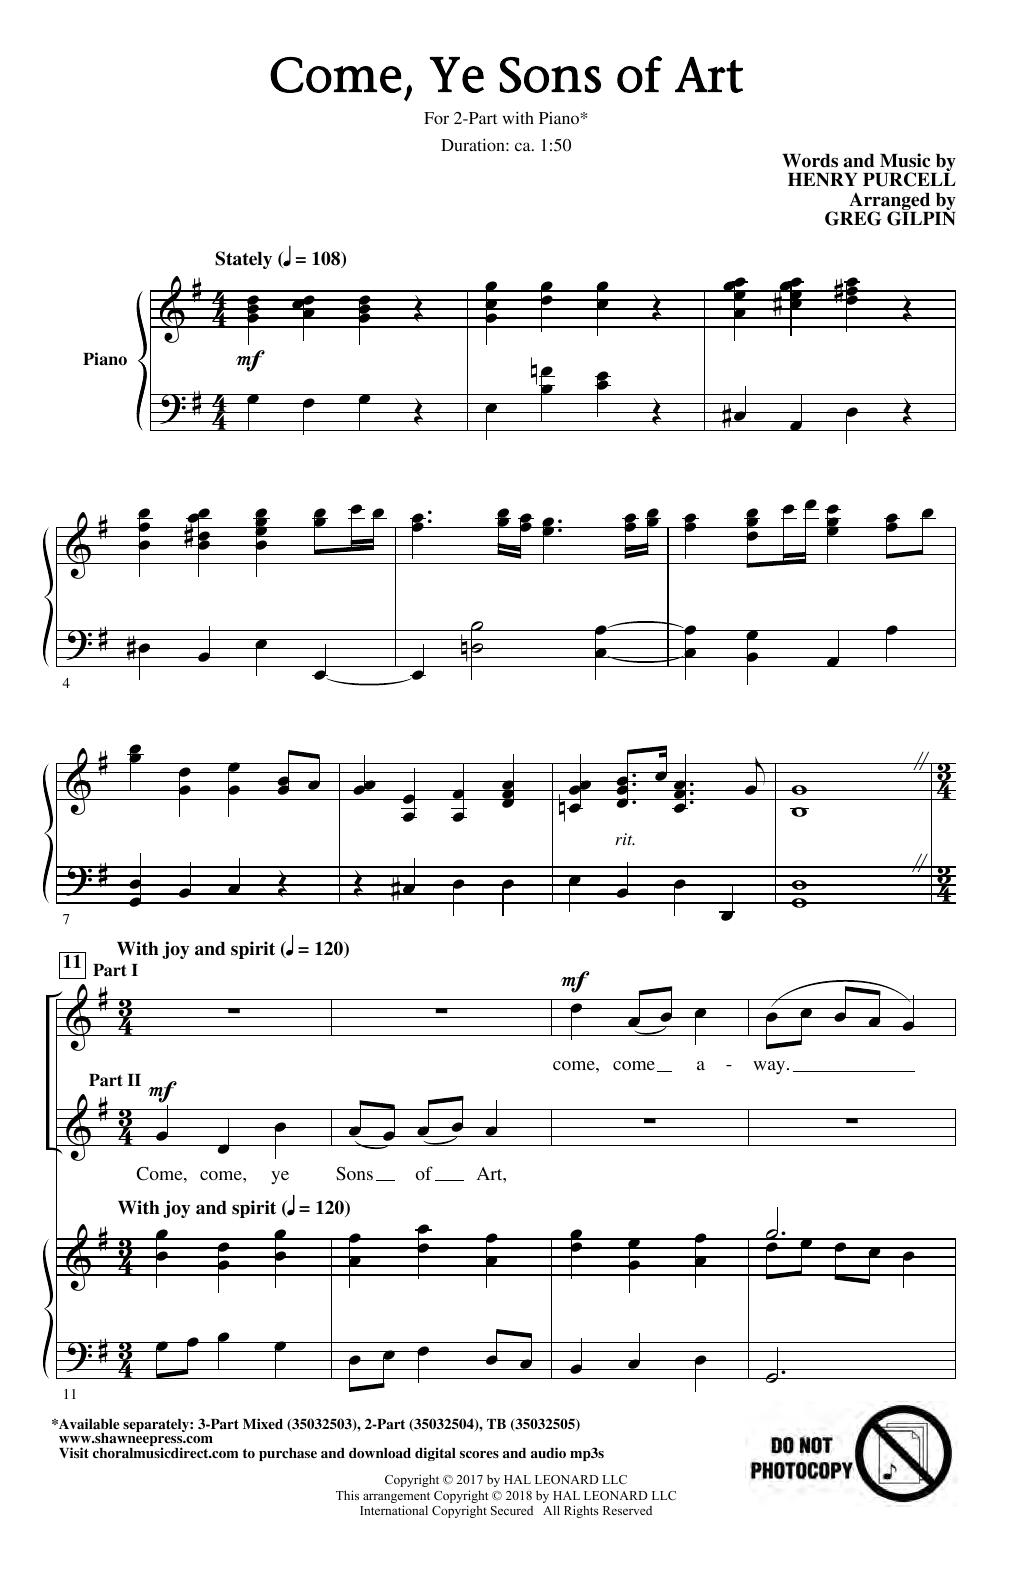 Come, Ye Sons Of Art (arr. Greg Gilpin) (2-Part Choir)